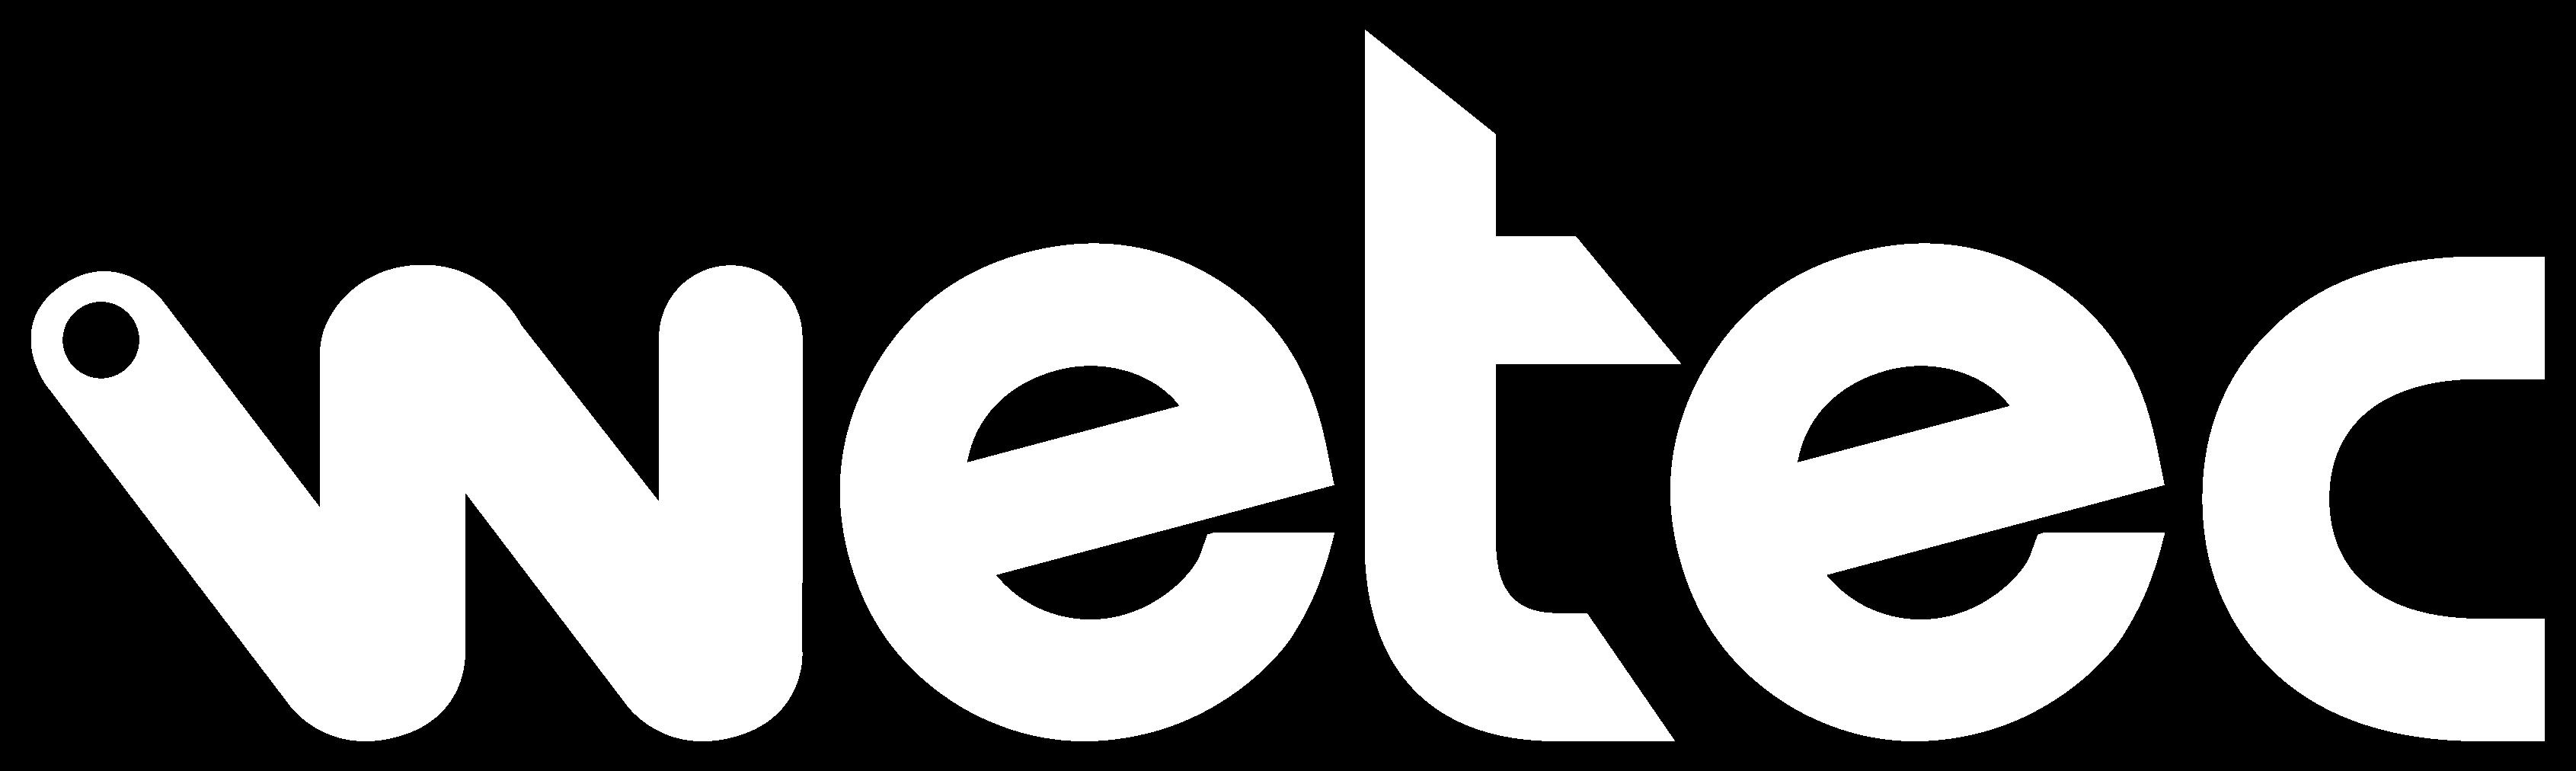 WETEC | Oficial